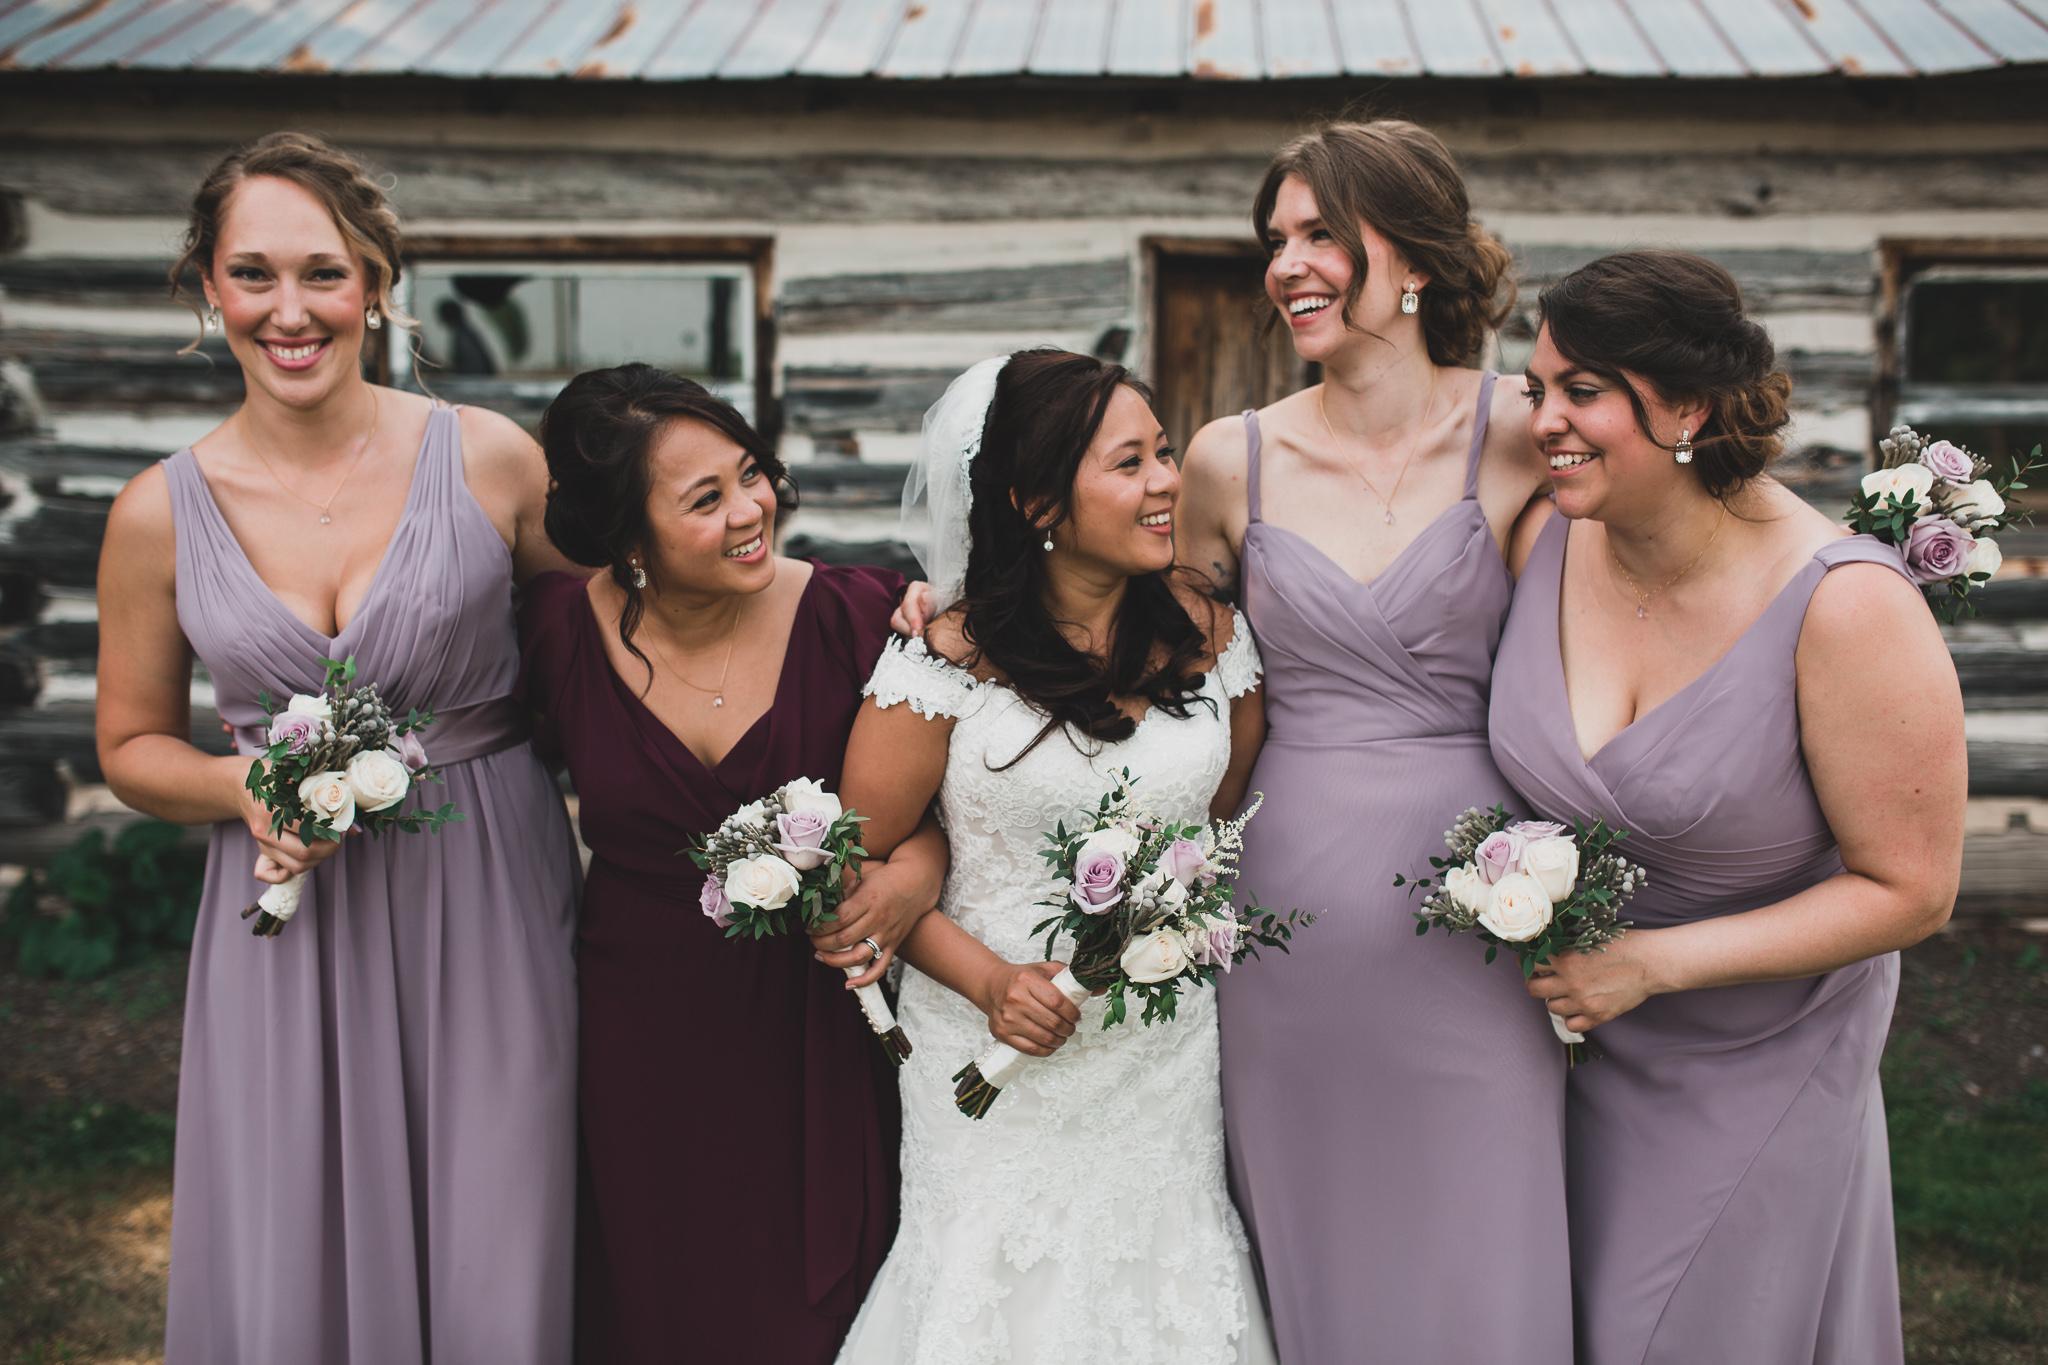 Naturally posed wedding photos, Eastern Ontario